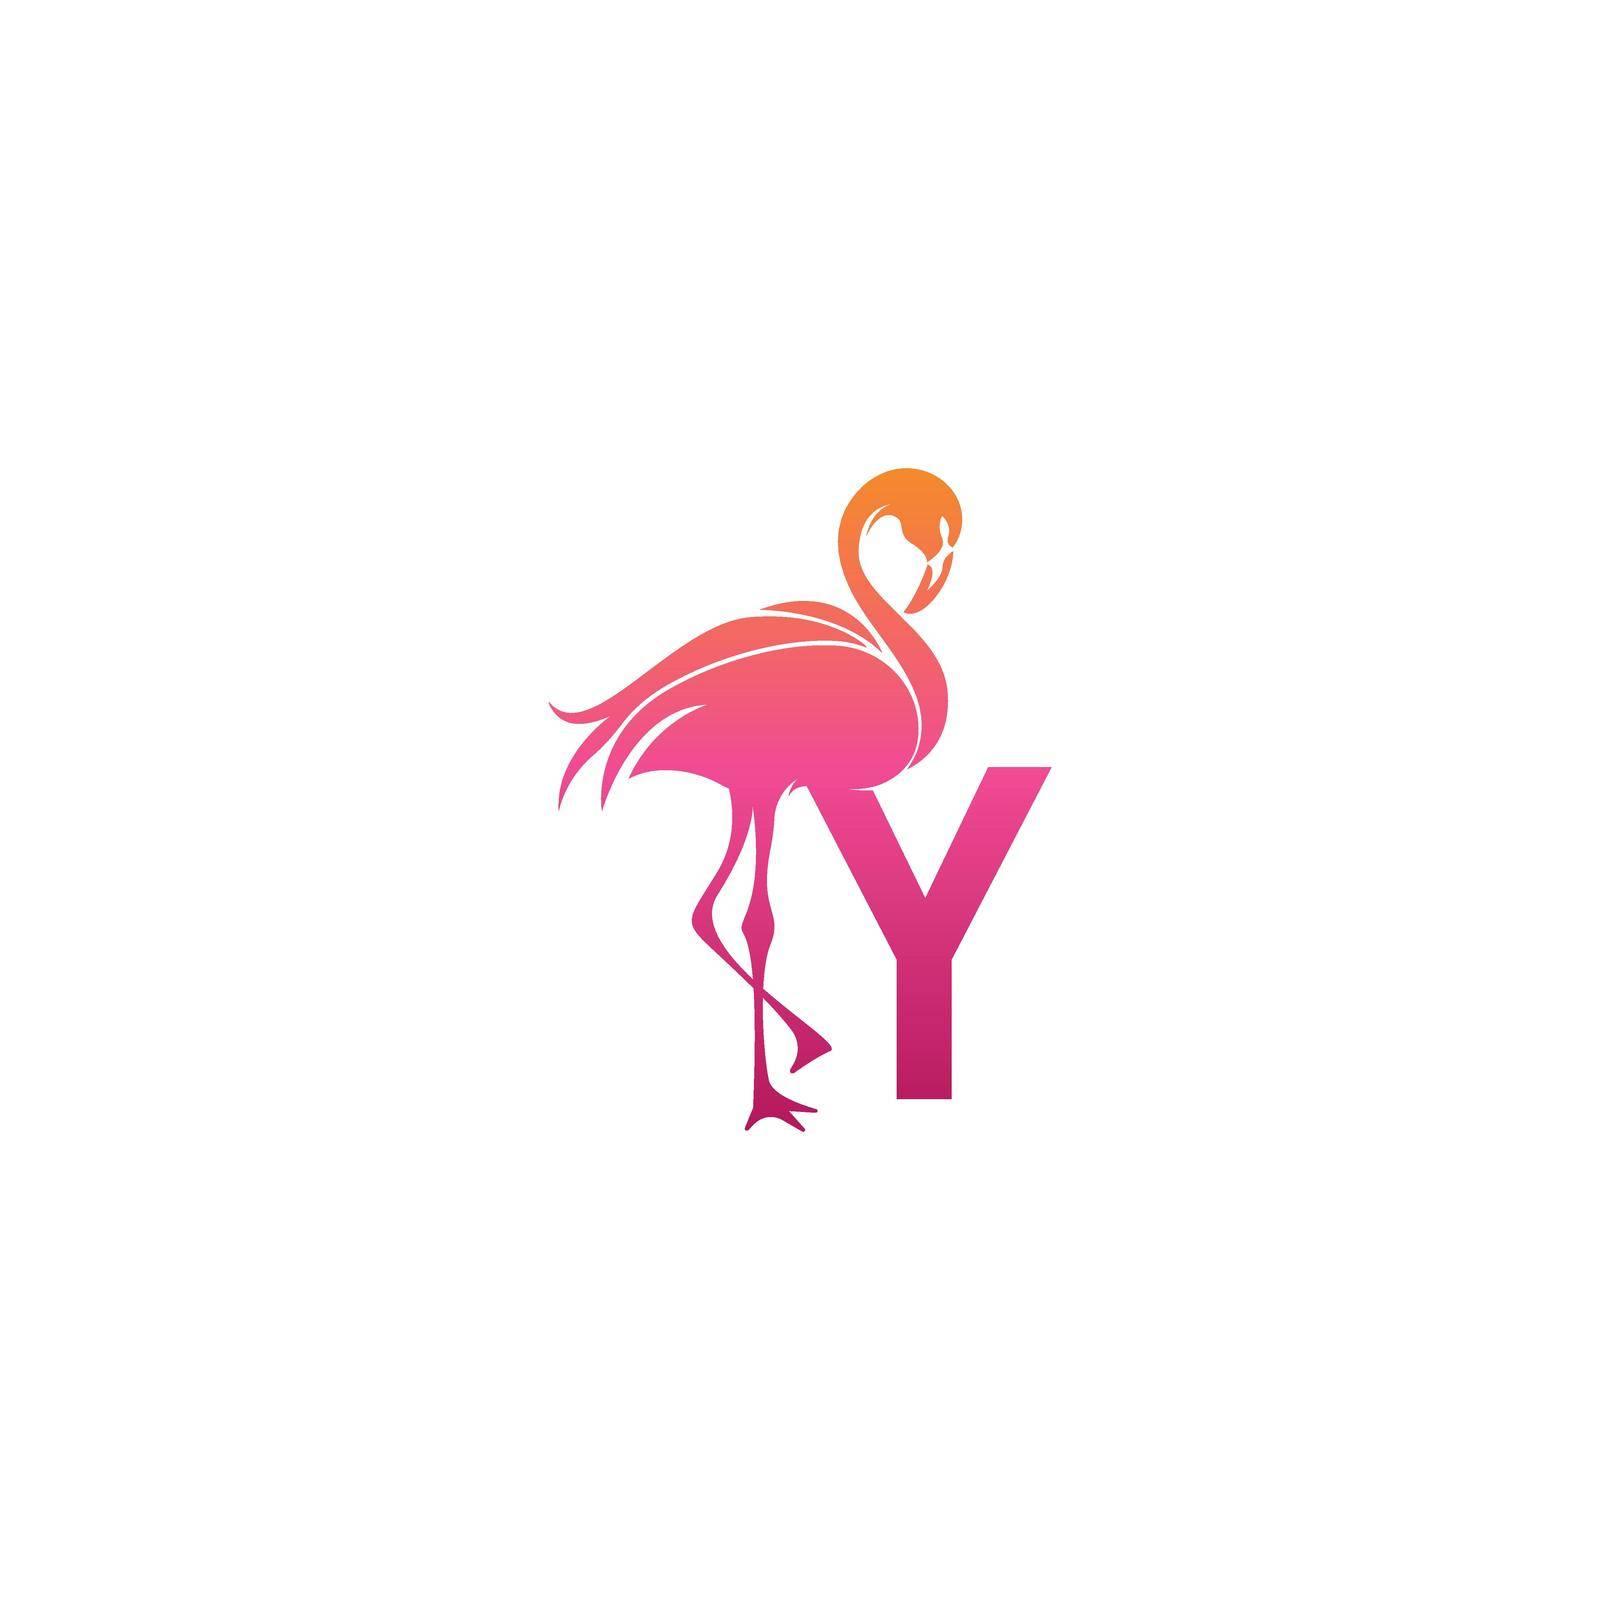 Flamingo bird icon with letter Y Logo design vector template